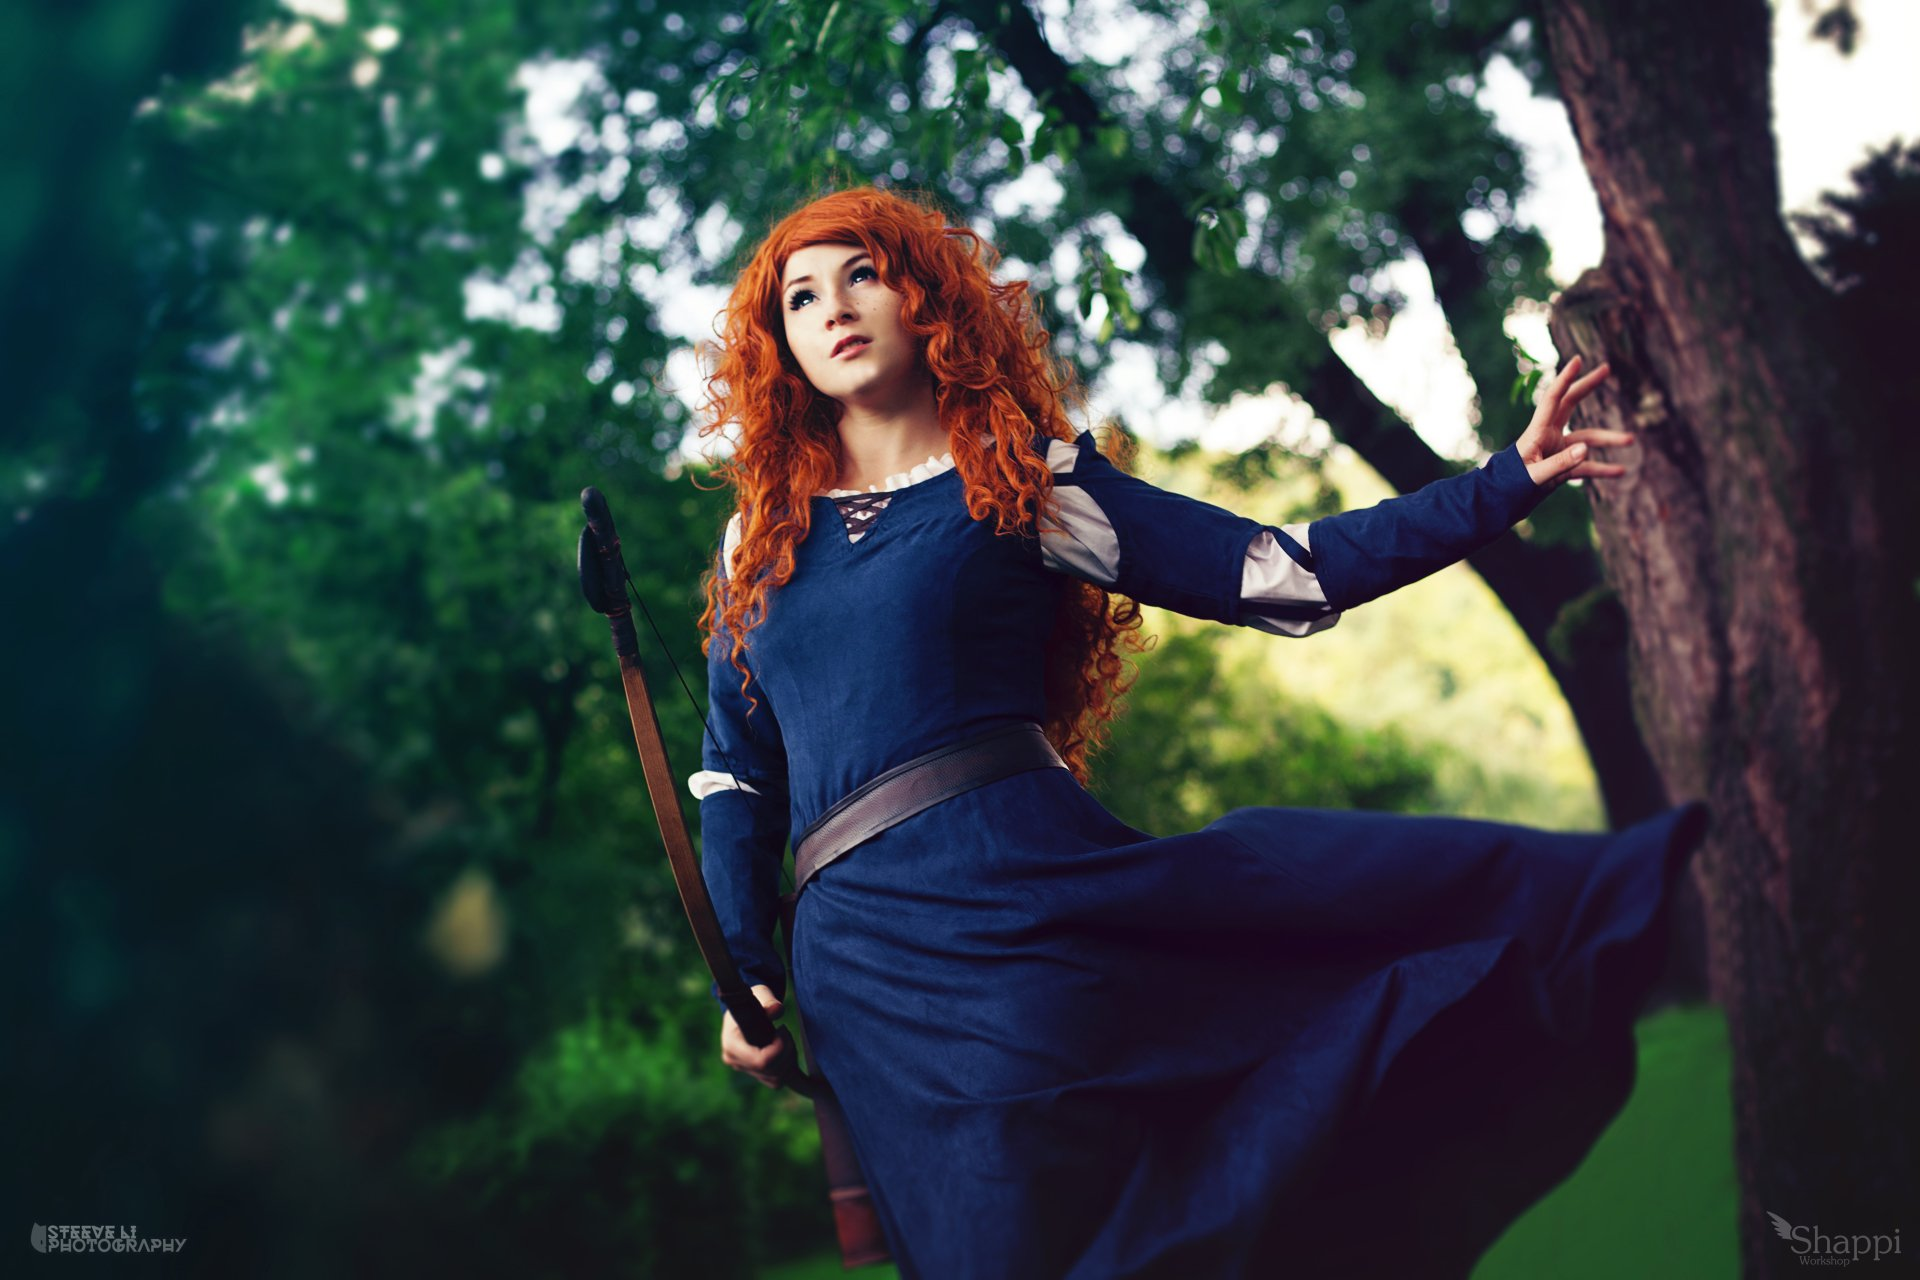 Women - Cosplay  Brave (Movie) Merida (Brave) Woman Model Girl Redhead Bow Blue Dress Bokeh Wallpaper